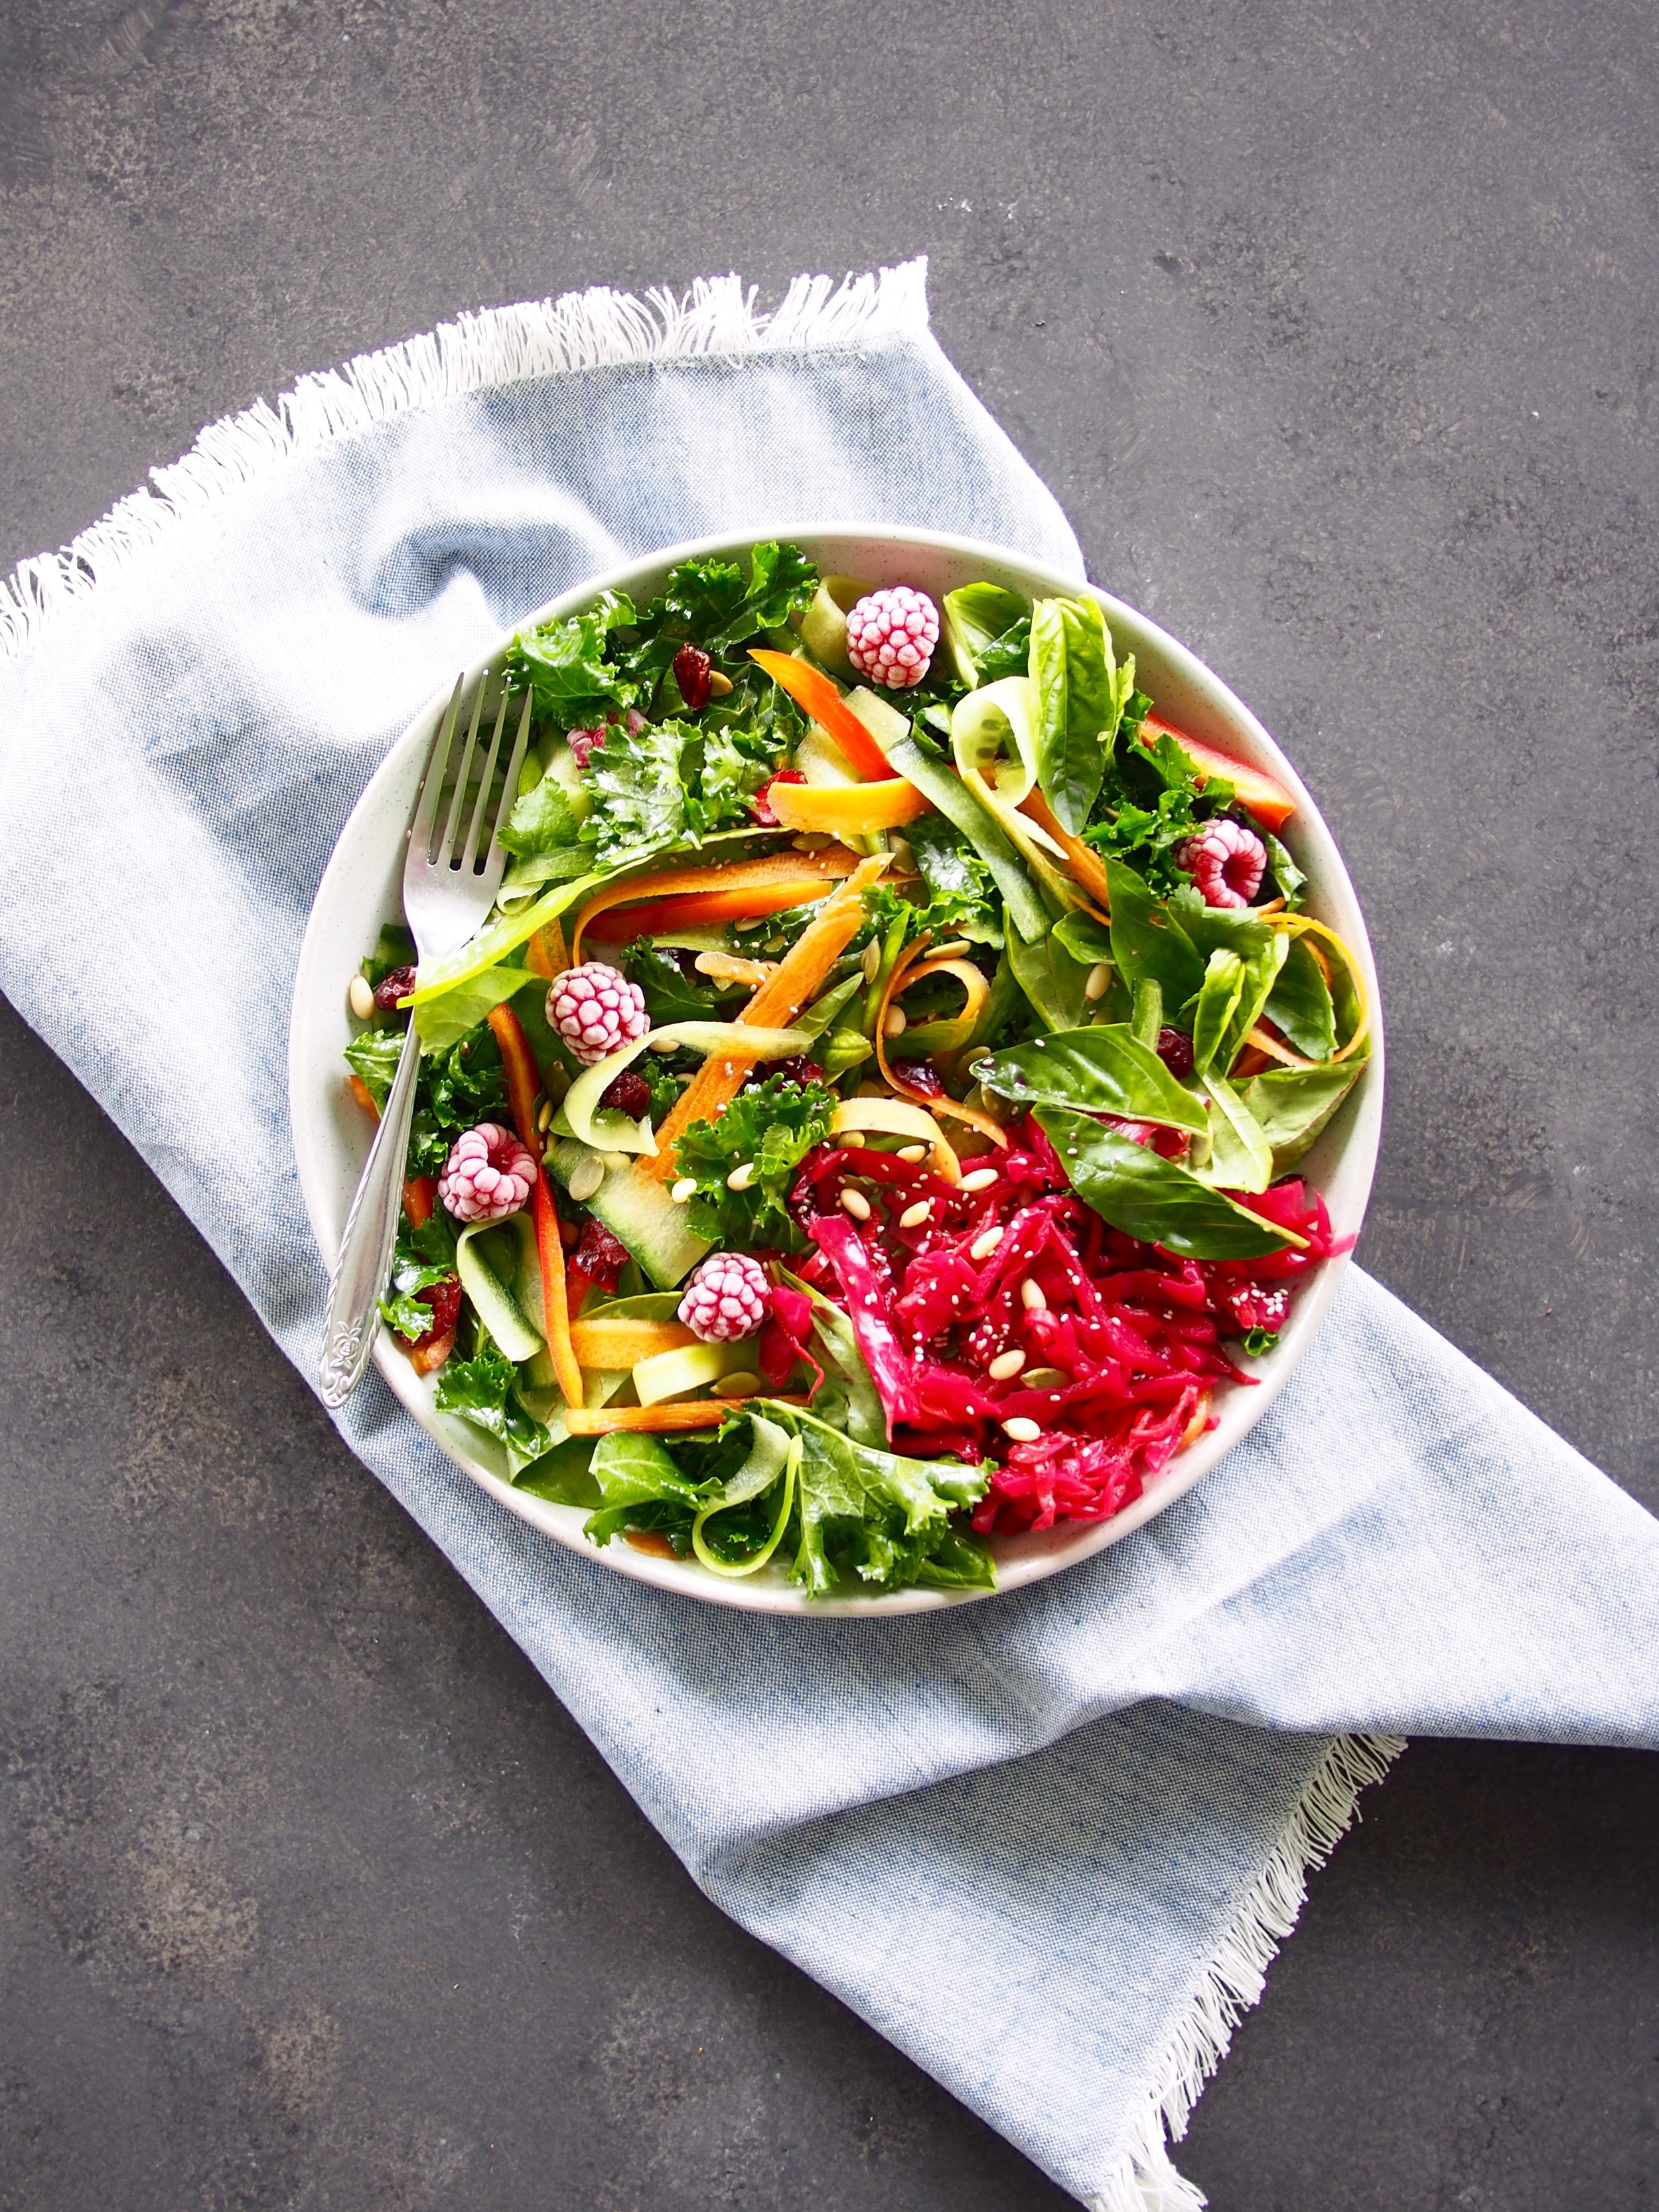 Salad Food Photography - Health Food Project